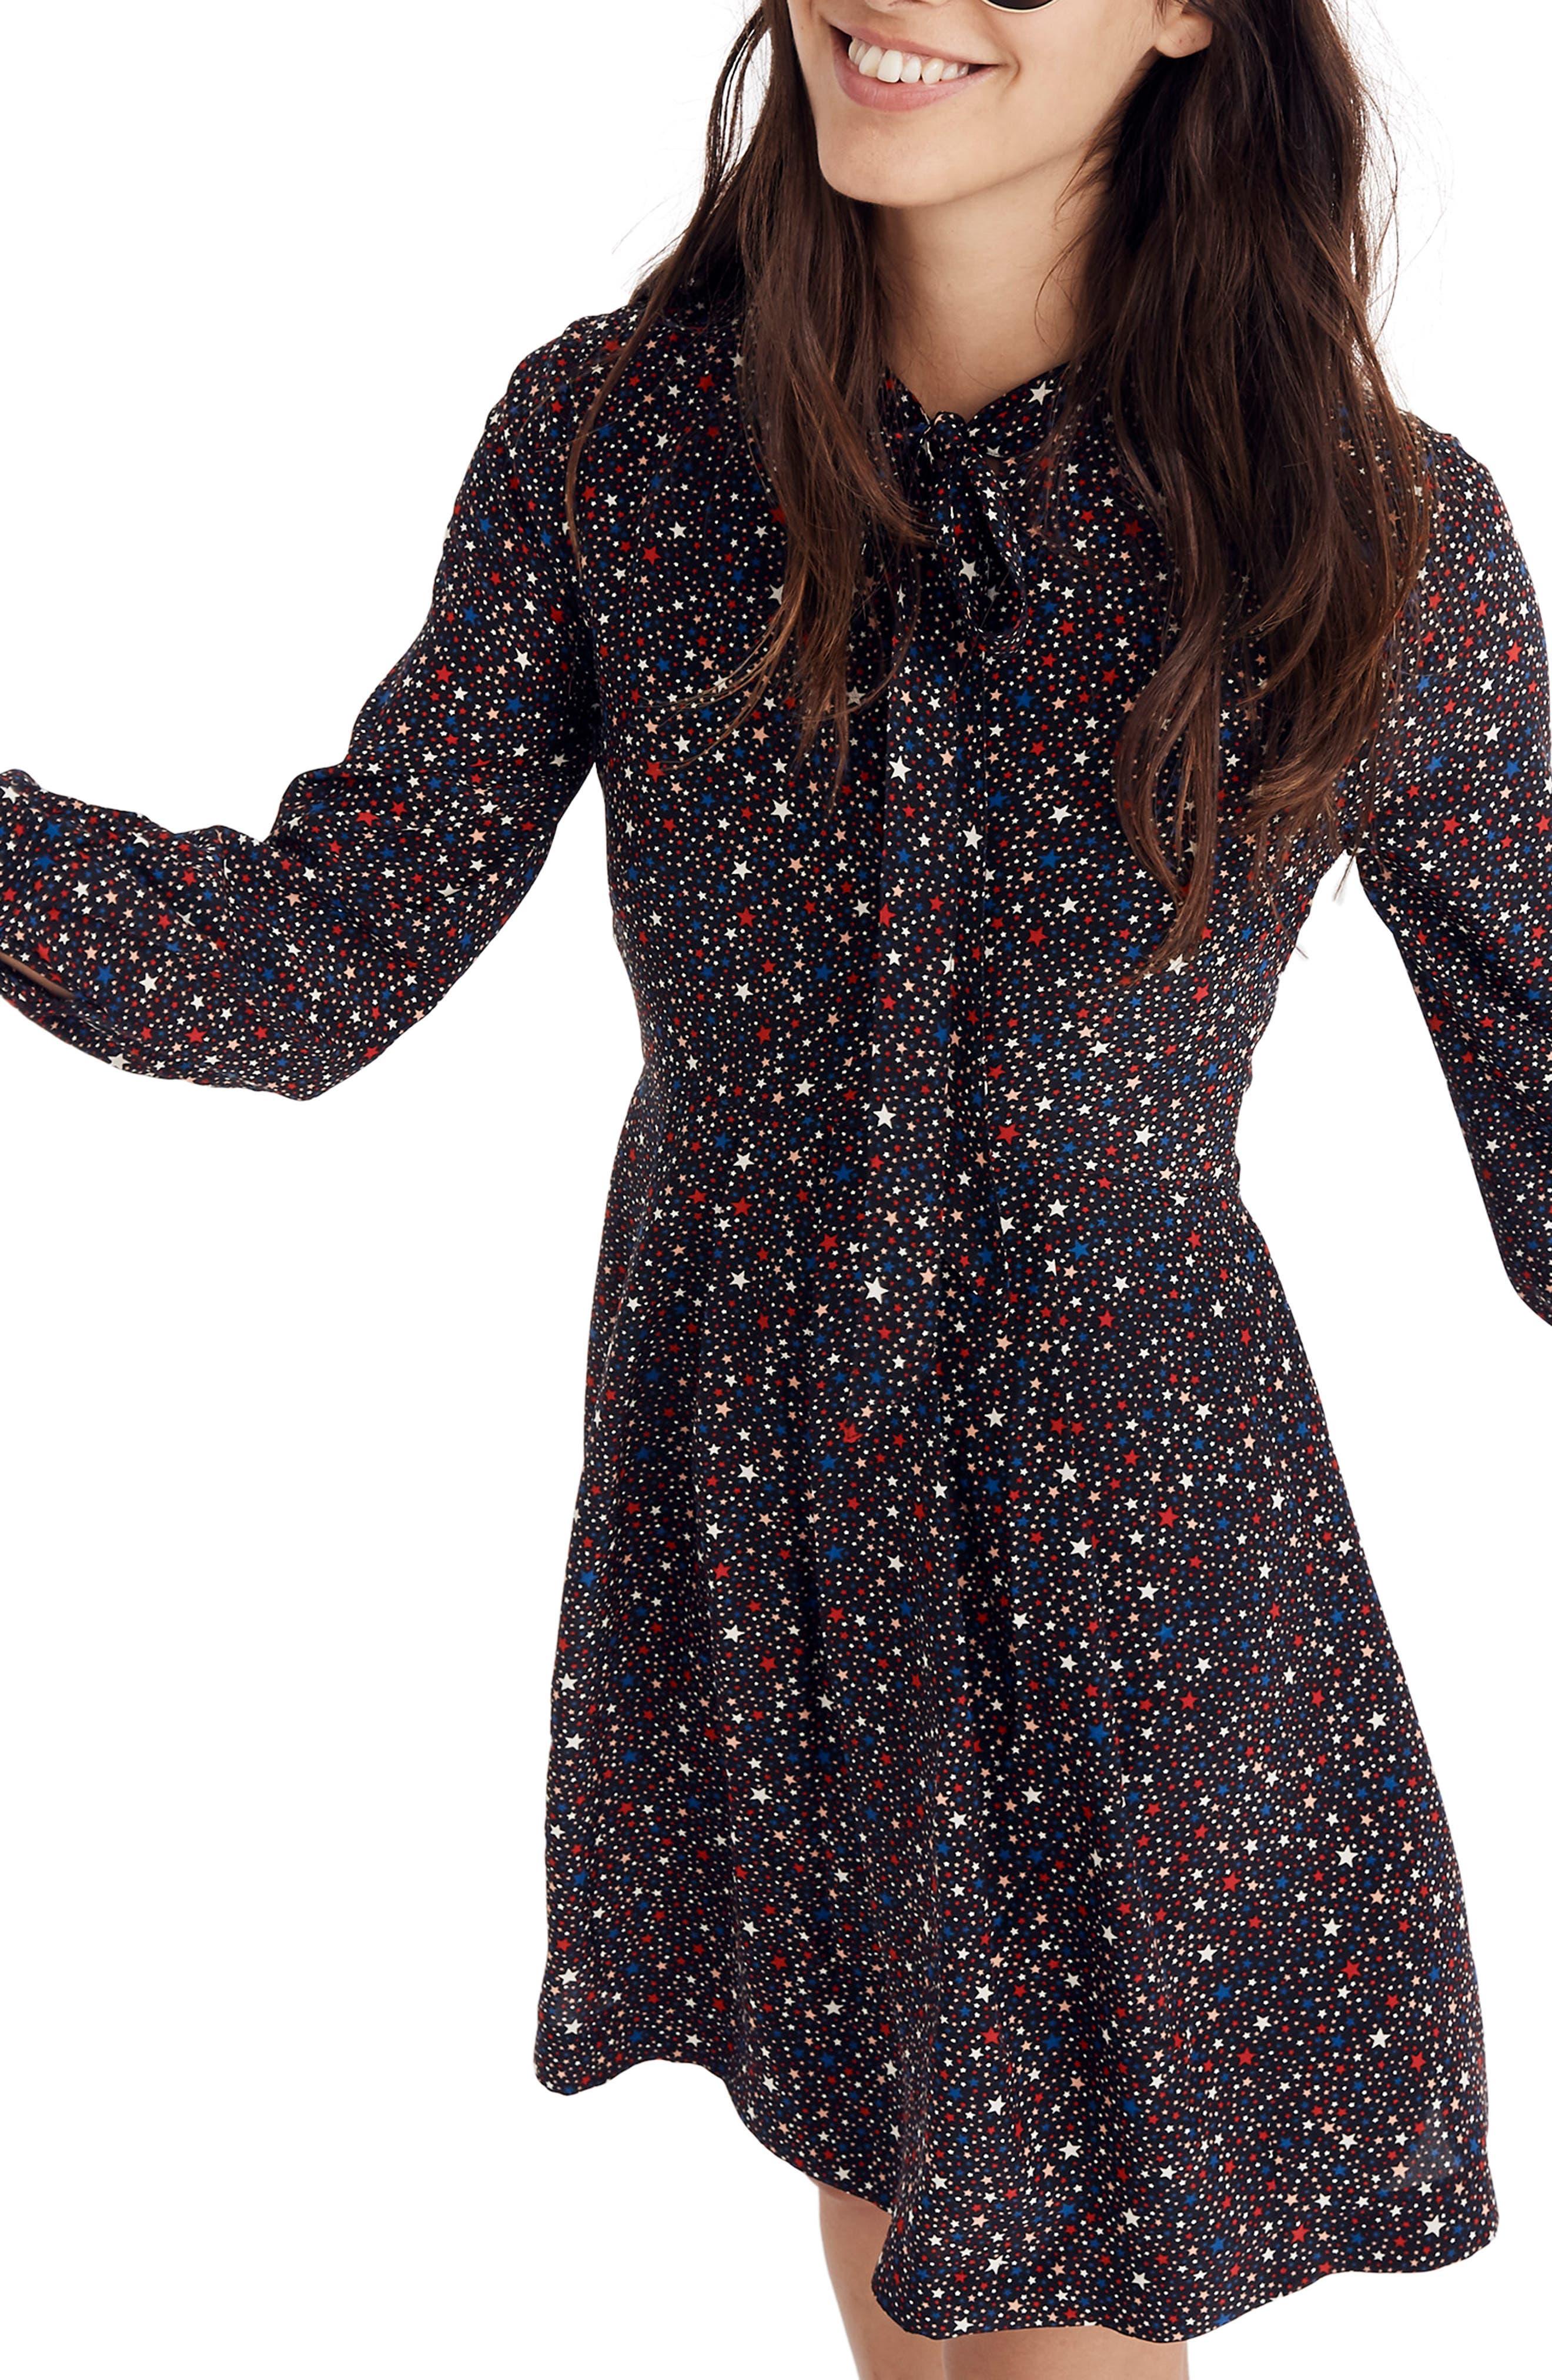 Balsam Tie-Neck Dress,                         Main,                         color, DARK MEDITERRANEAN